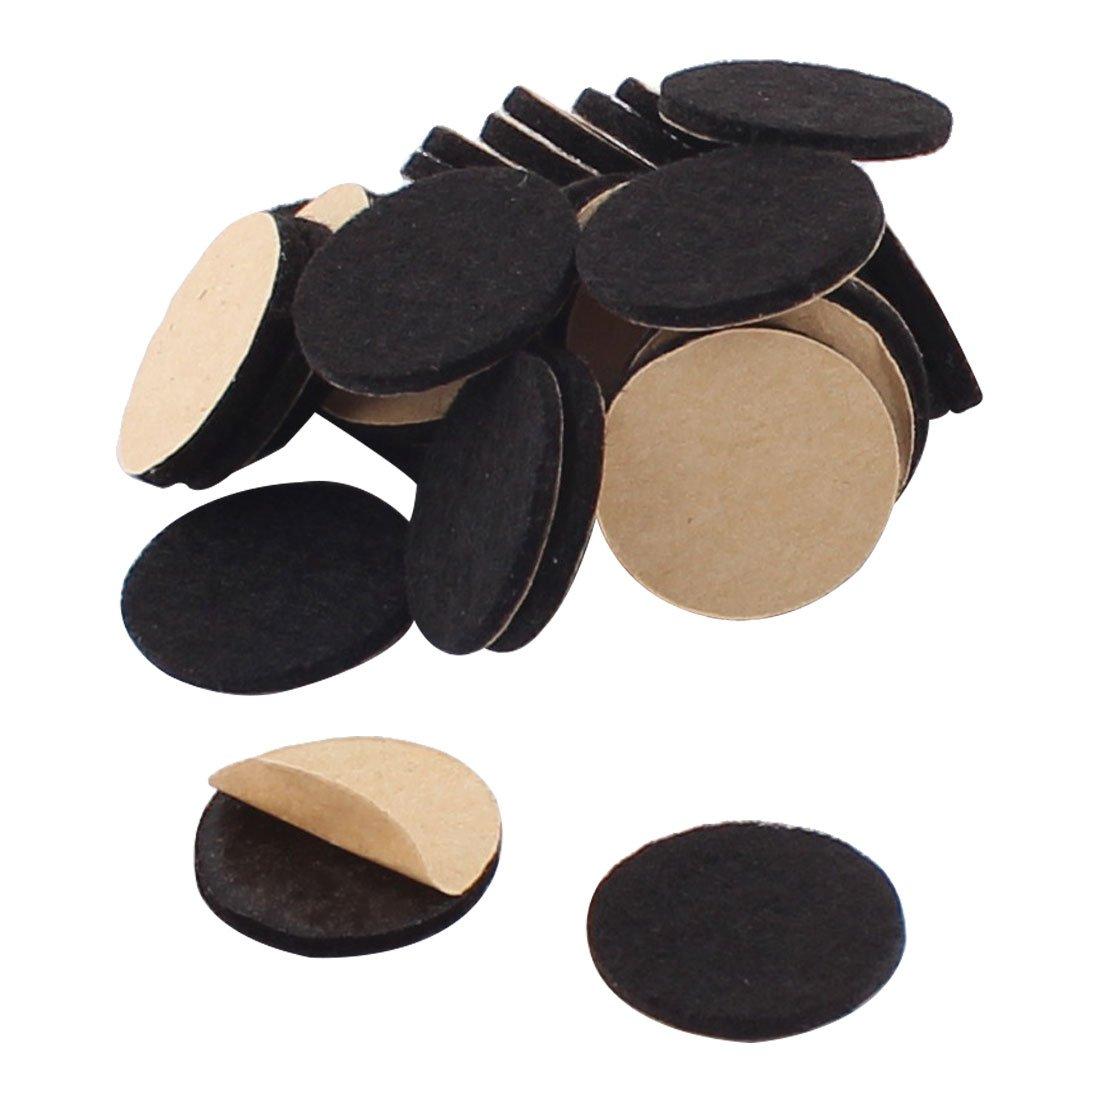 uxcell Houseware Self Stick Protecting Protecter Furniture Felt Cushions Pads Mats 20mm 30pcs Black a16050600ux0707